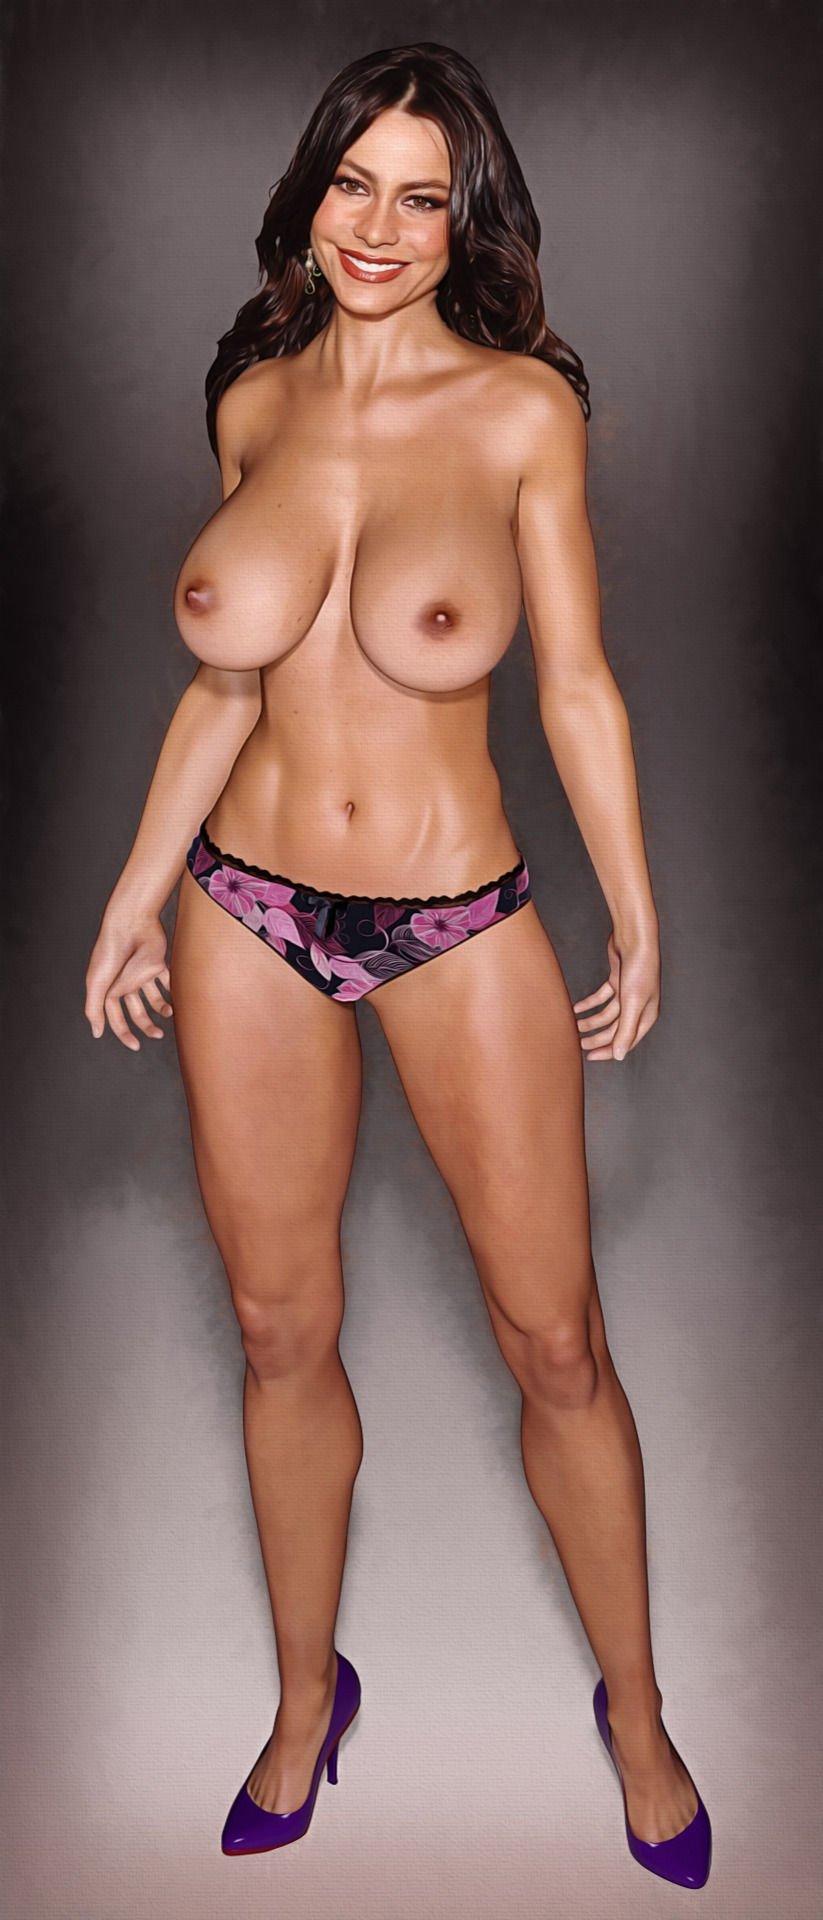 Sofia Carson Nude Leaked Fappening Photos